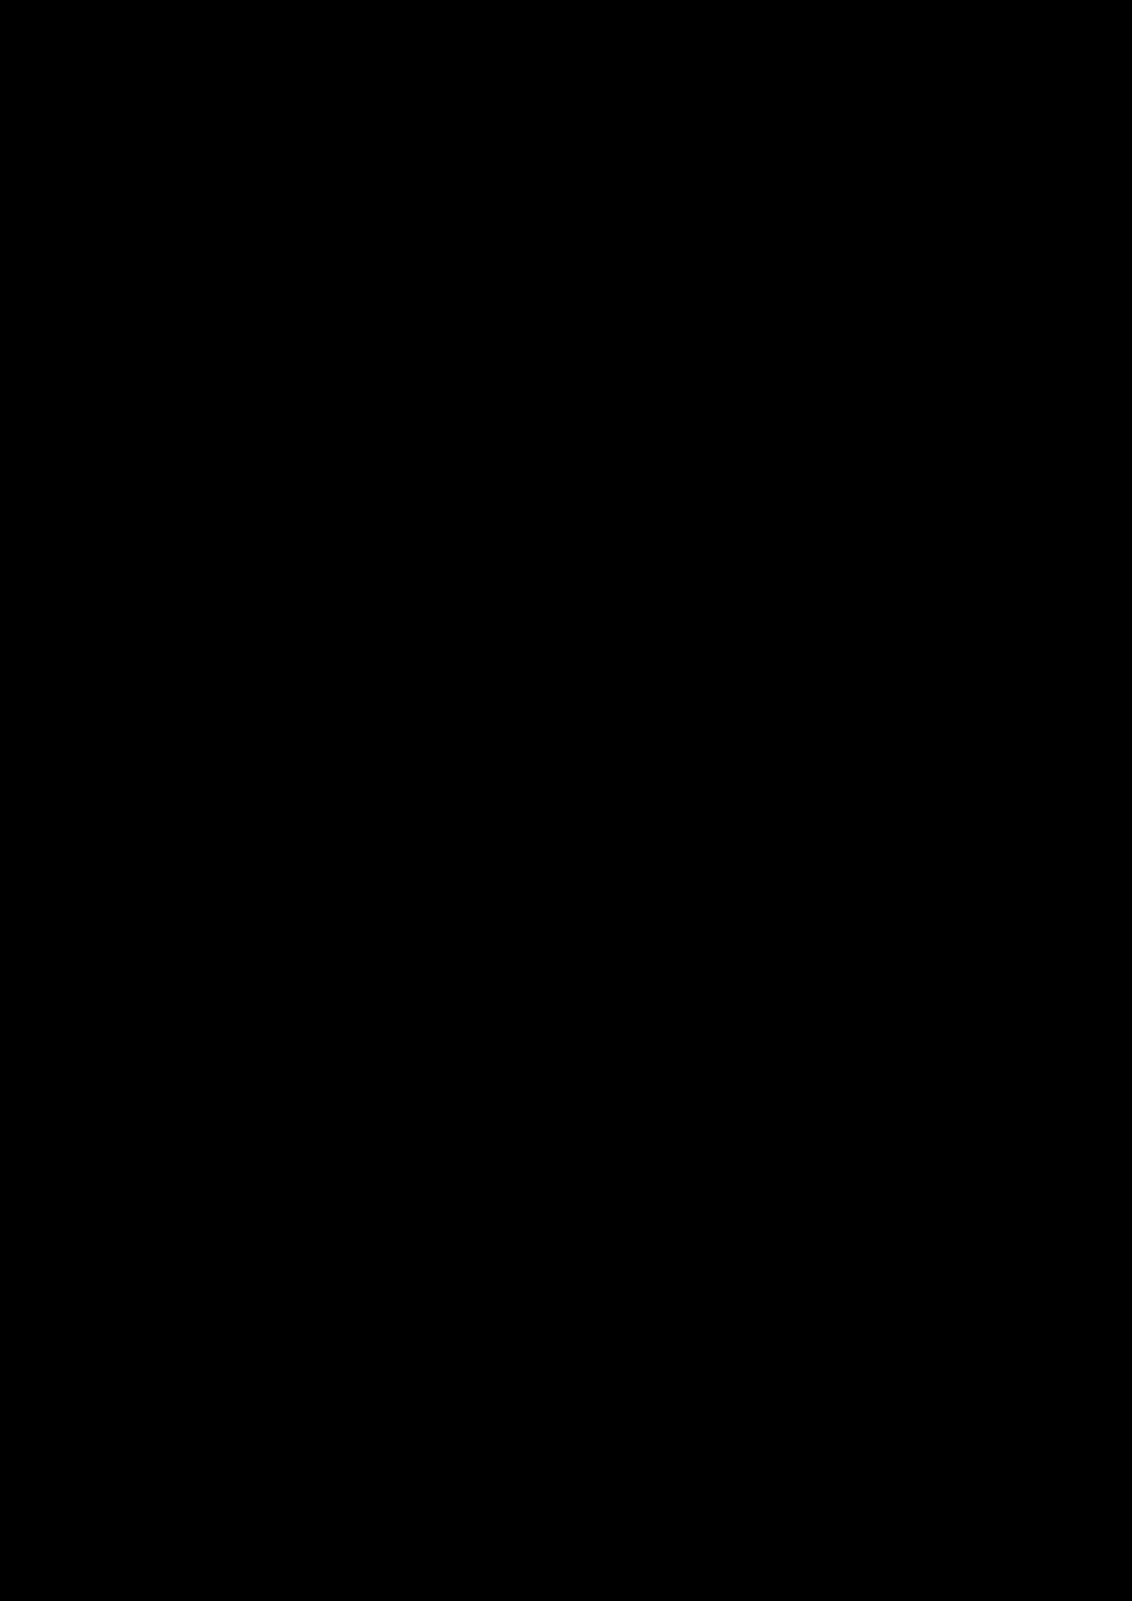 Belyiy sokol slide, Image 79